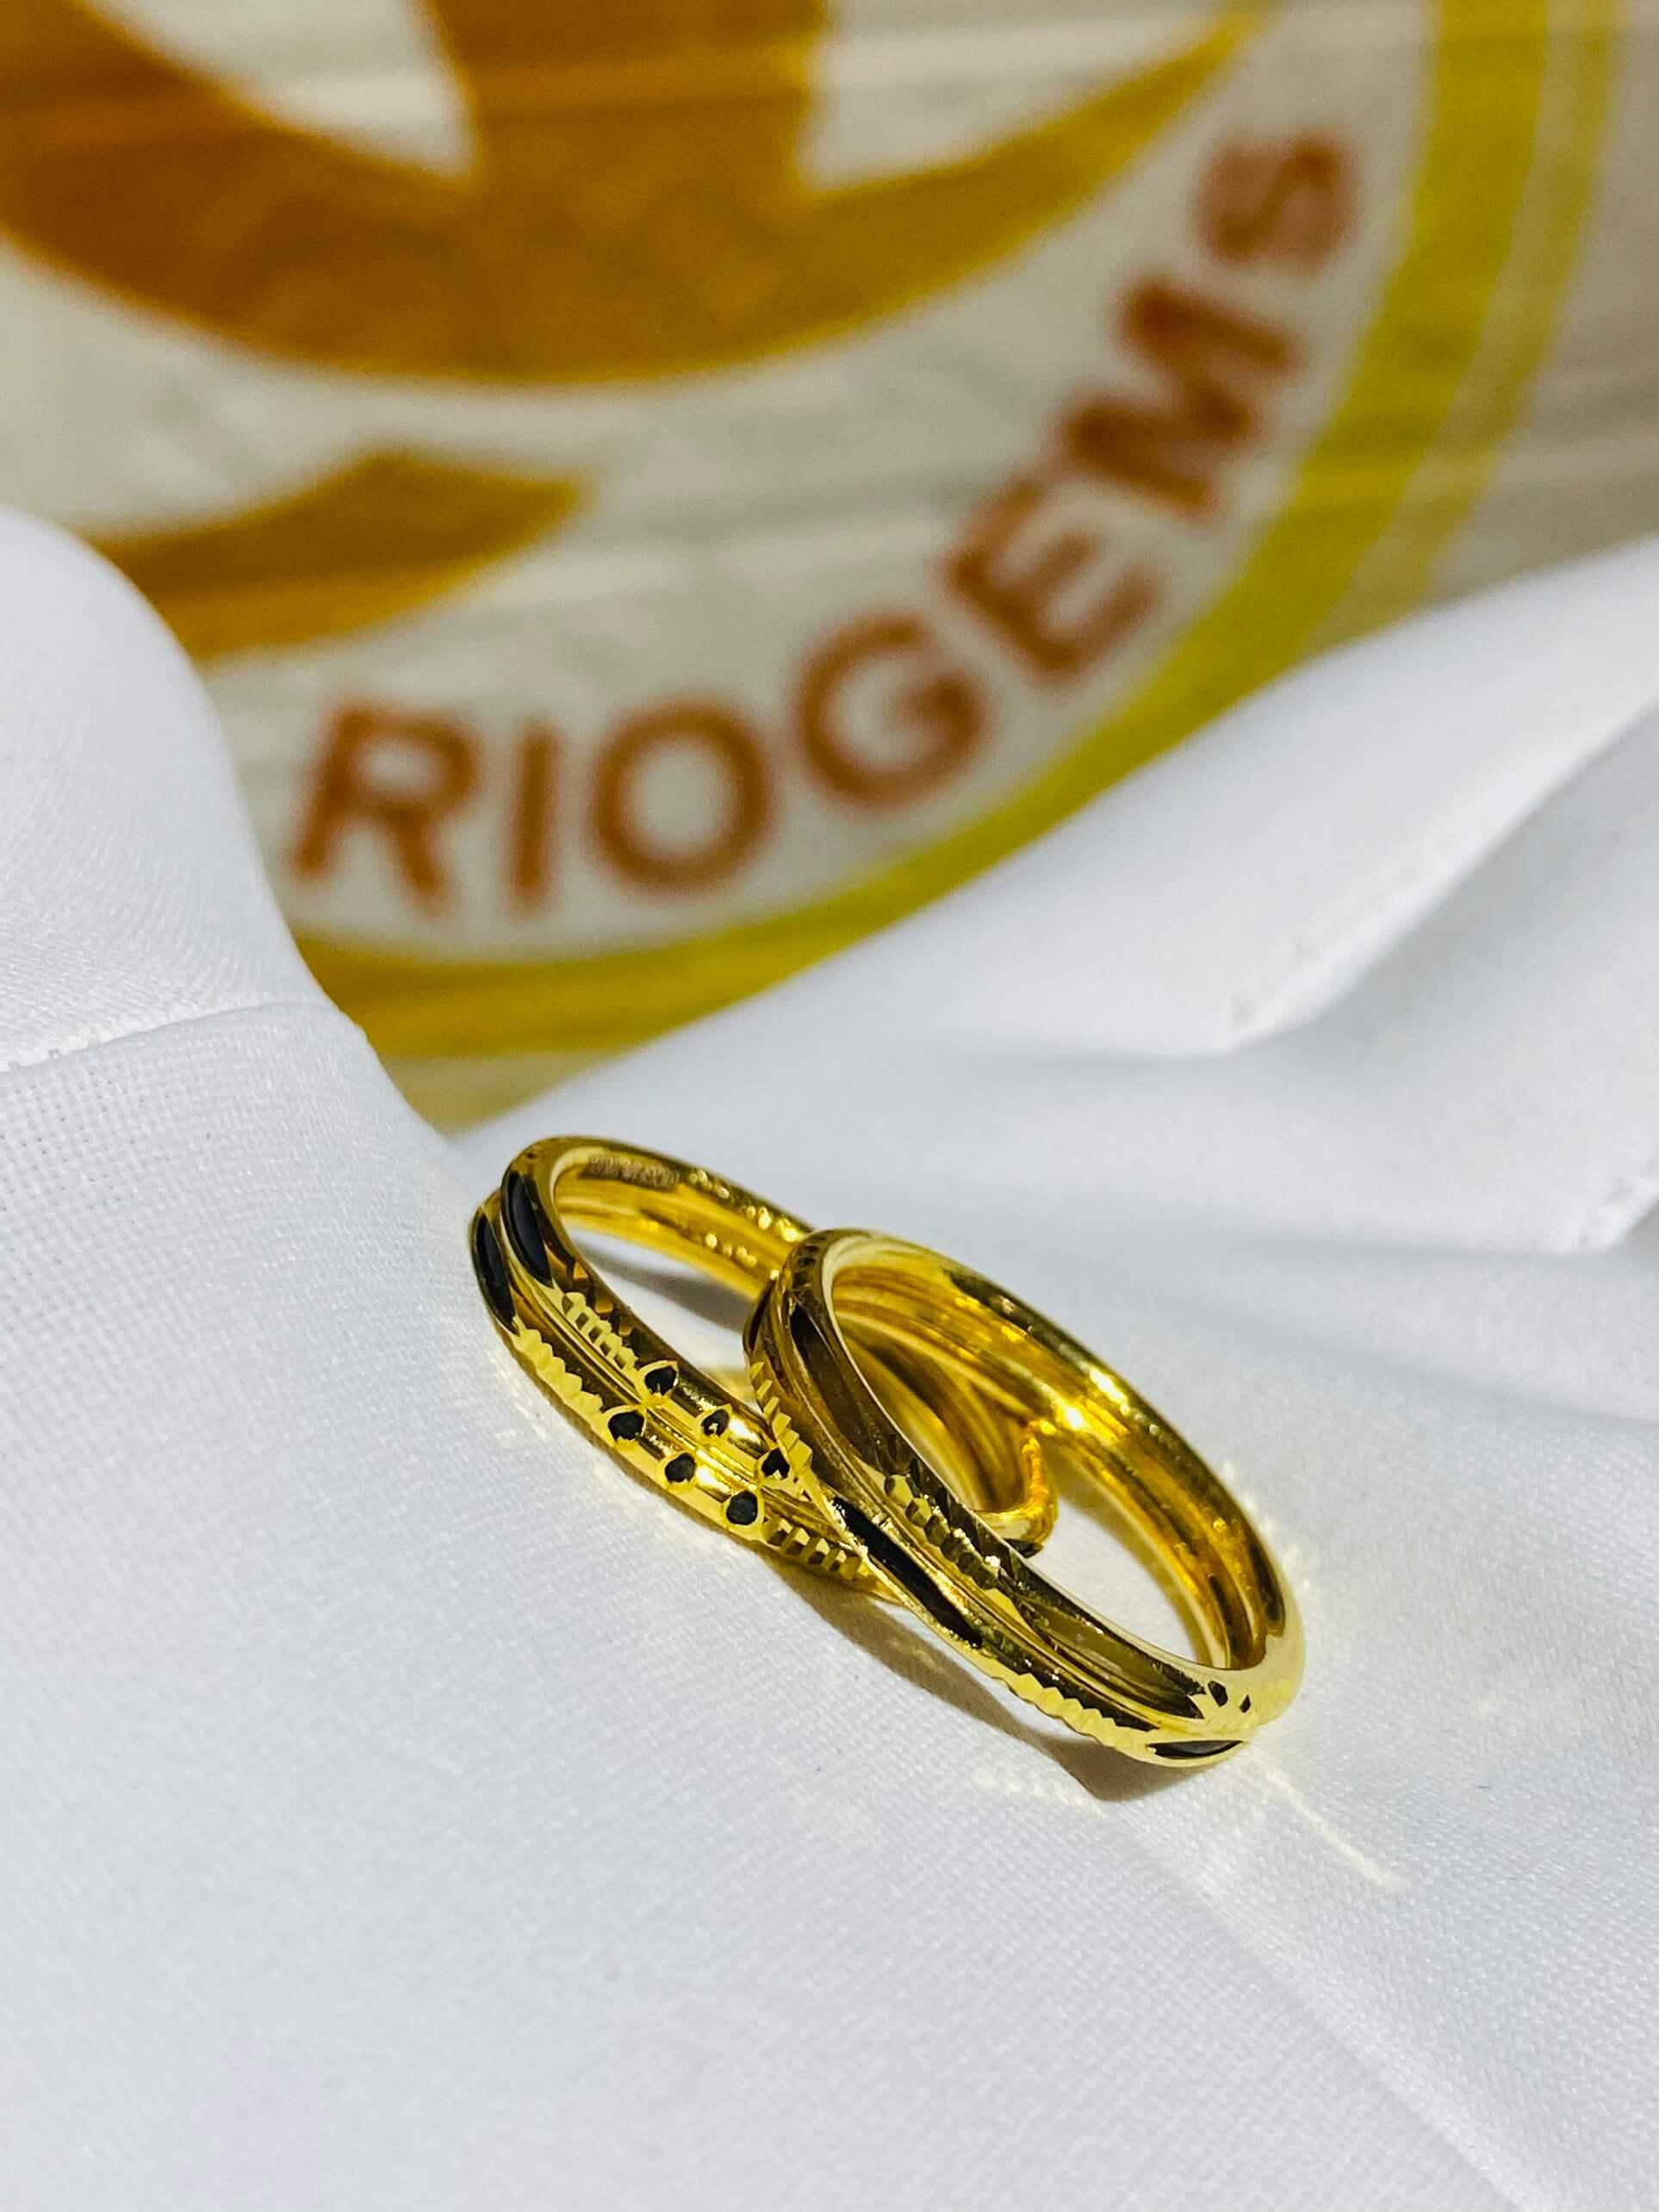 Cap-nhan-Long-Voi-kep-Riogems